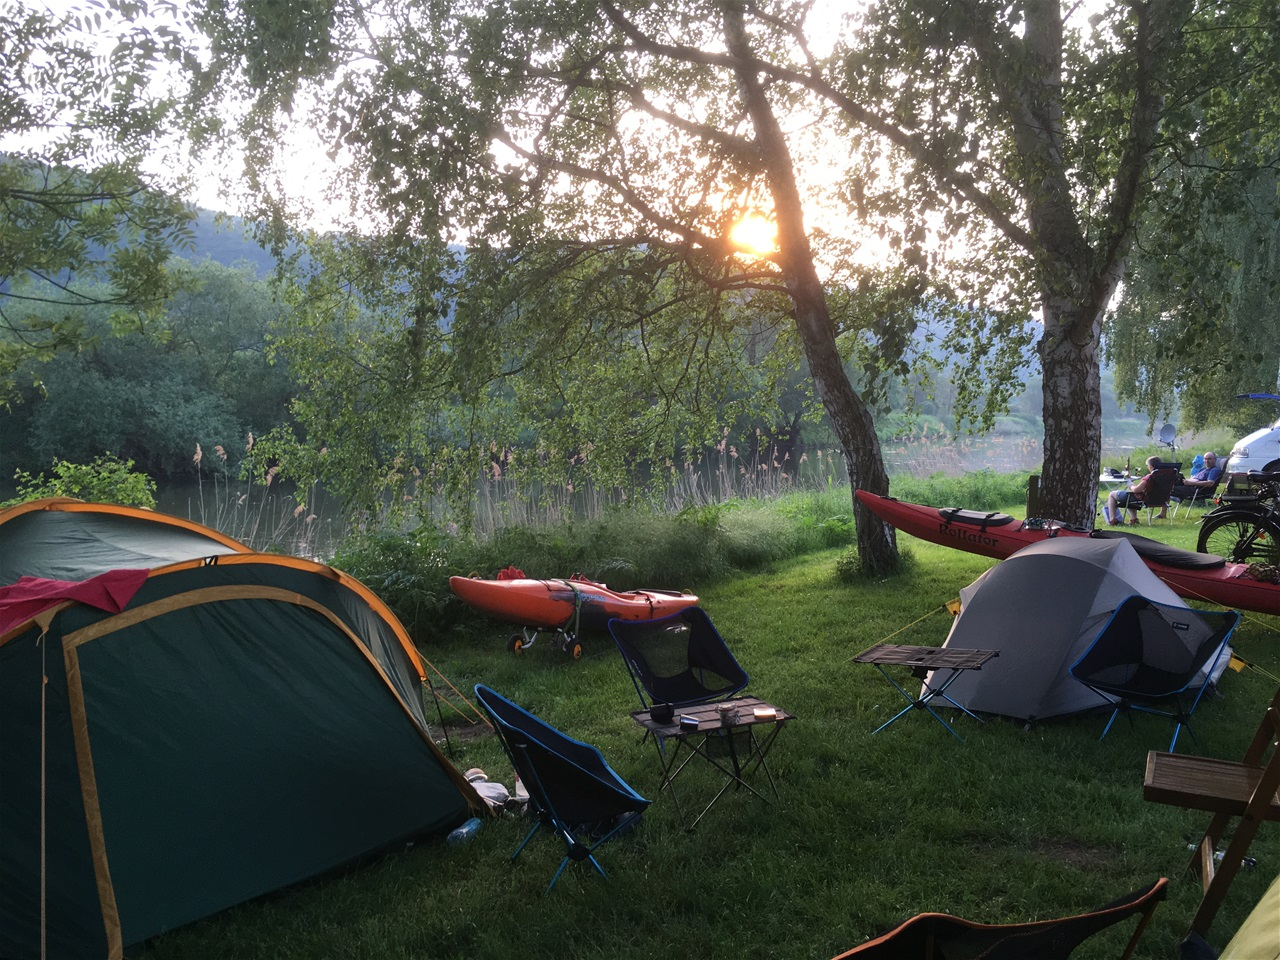 Campingplatz Altenburschla